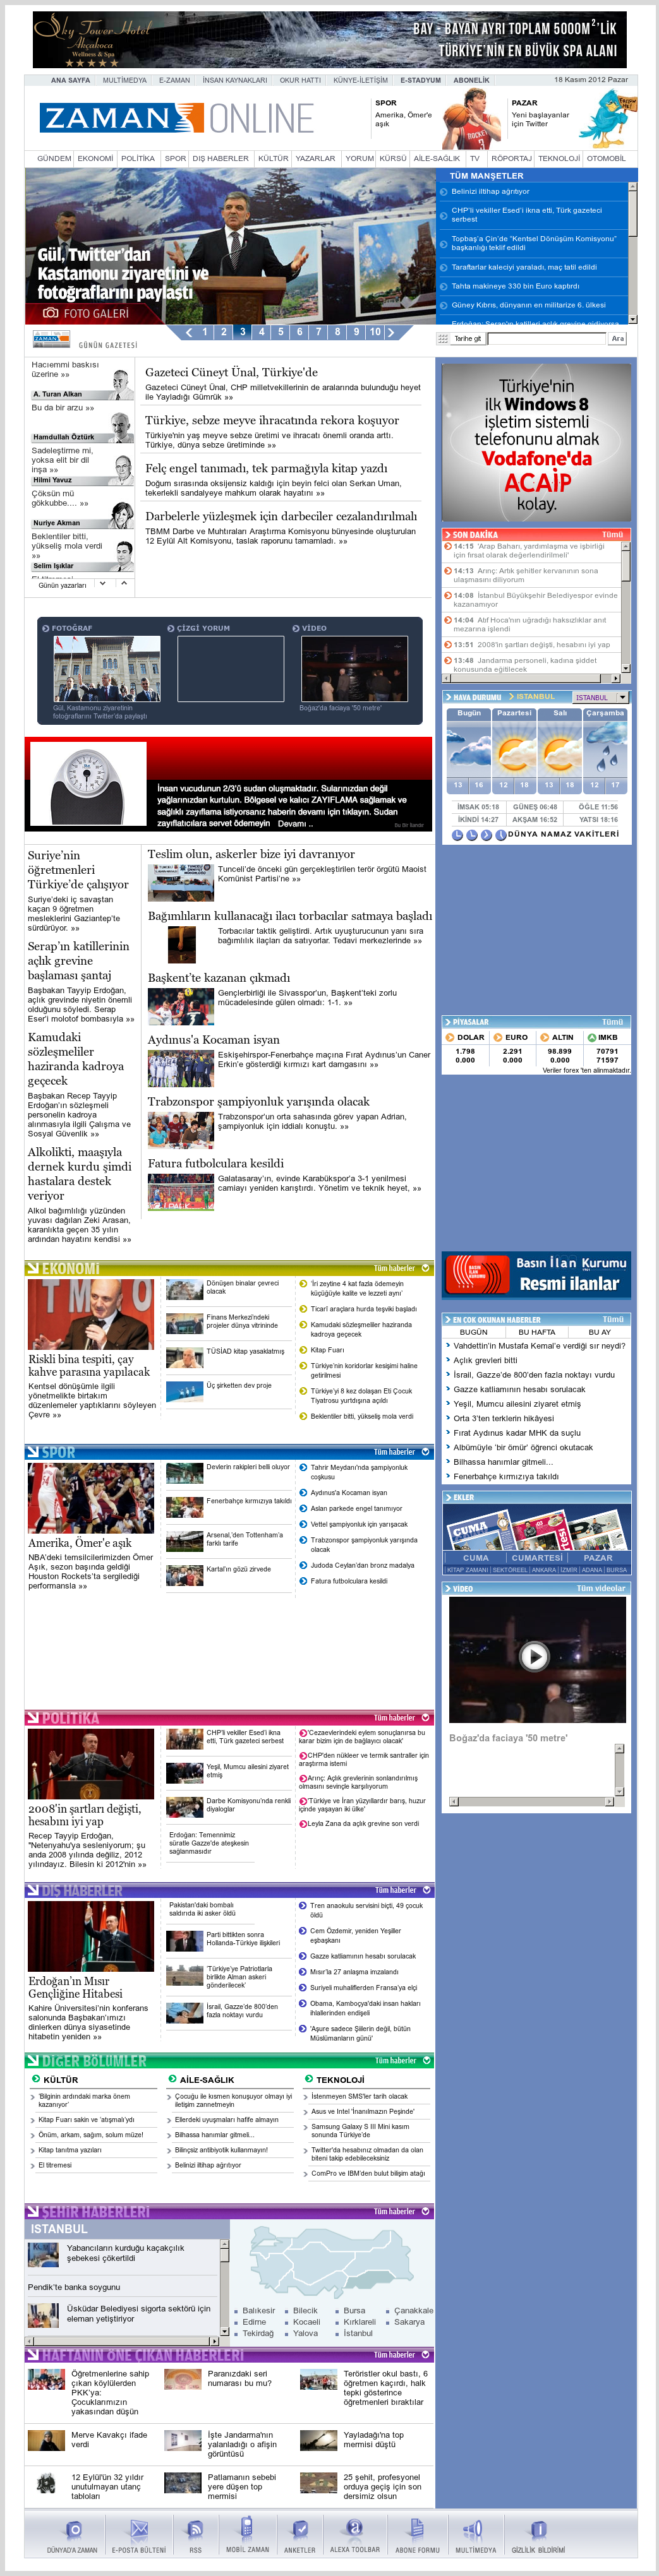 Zaman Online at Sunday Nov. 18, 2012, 12:33 p.m. UTC